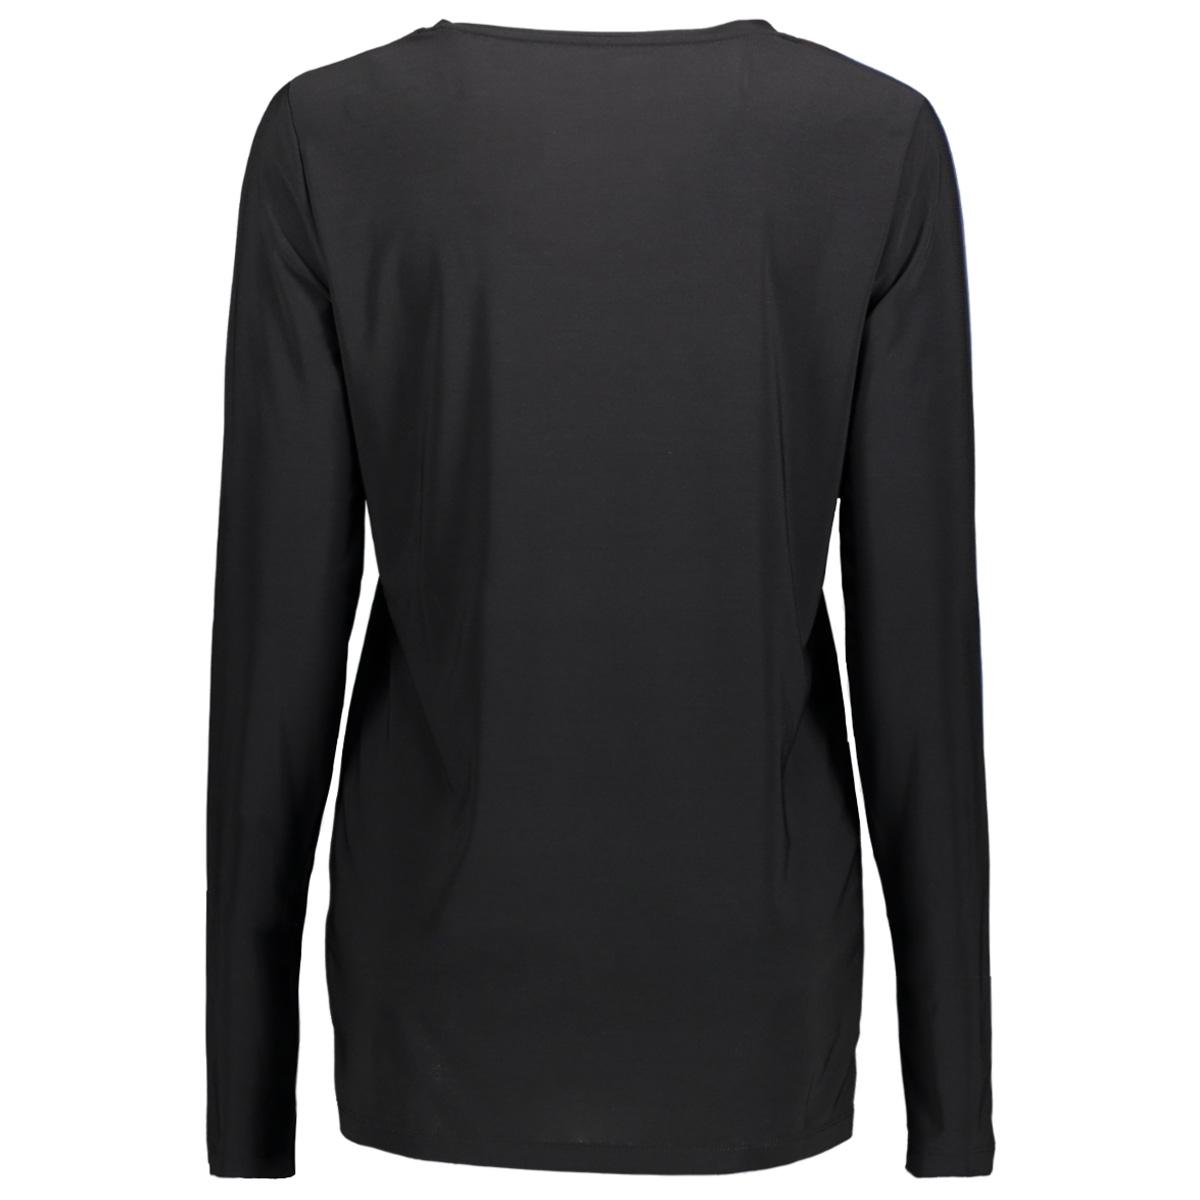 bonny zoso t-shirt black/blue